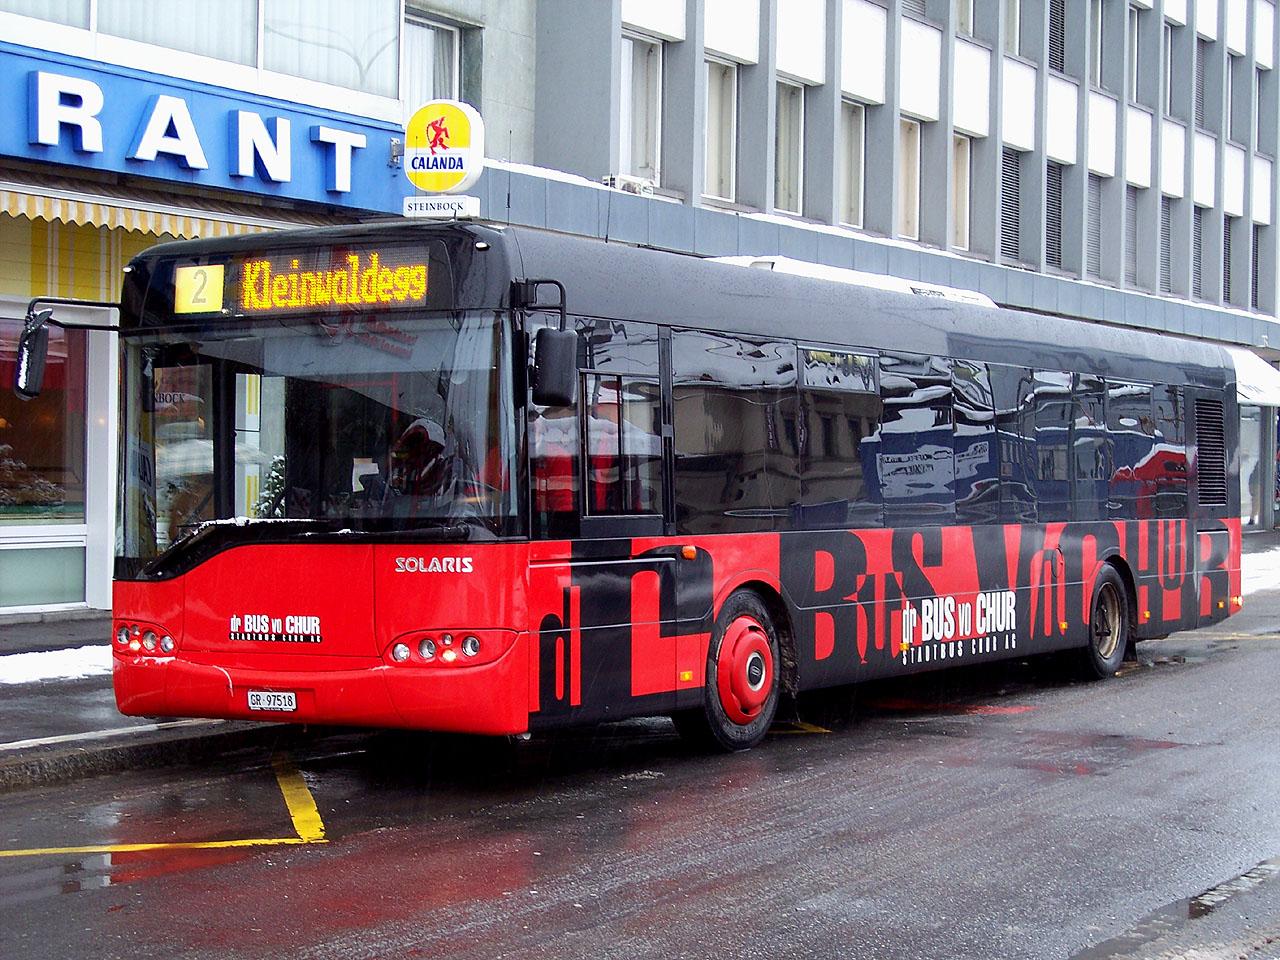 Vilnius Coach Station To City Centre